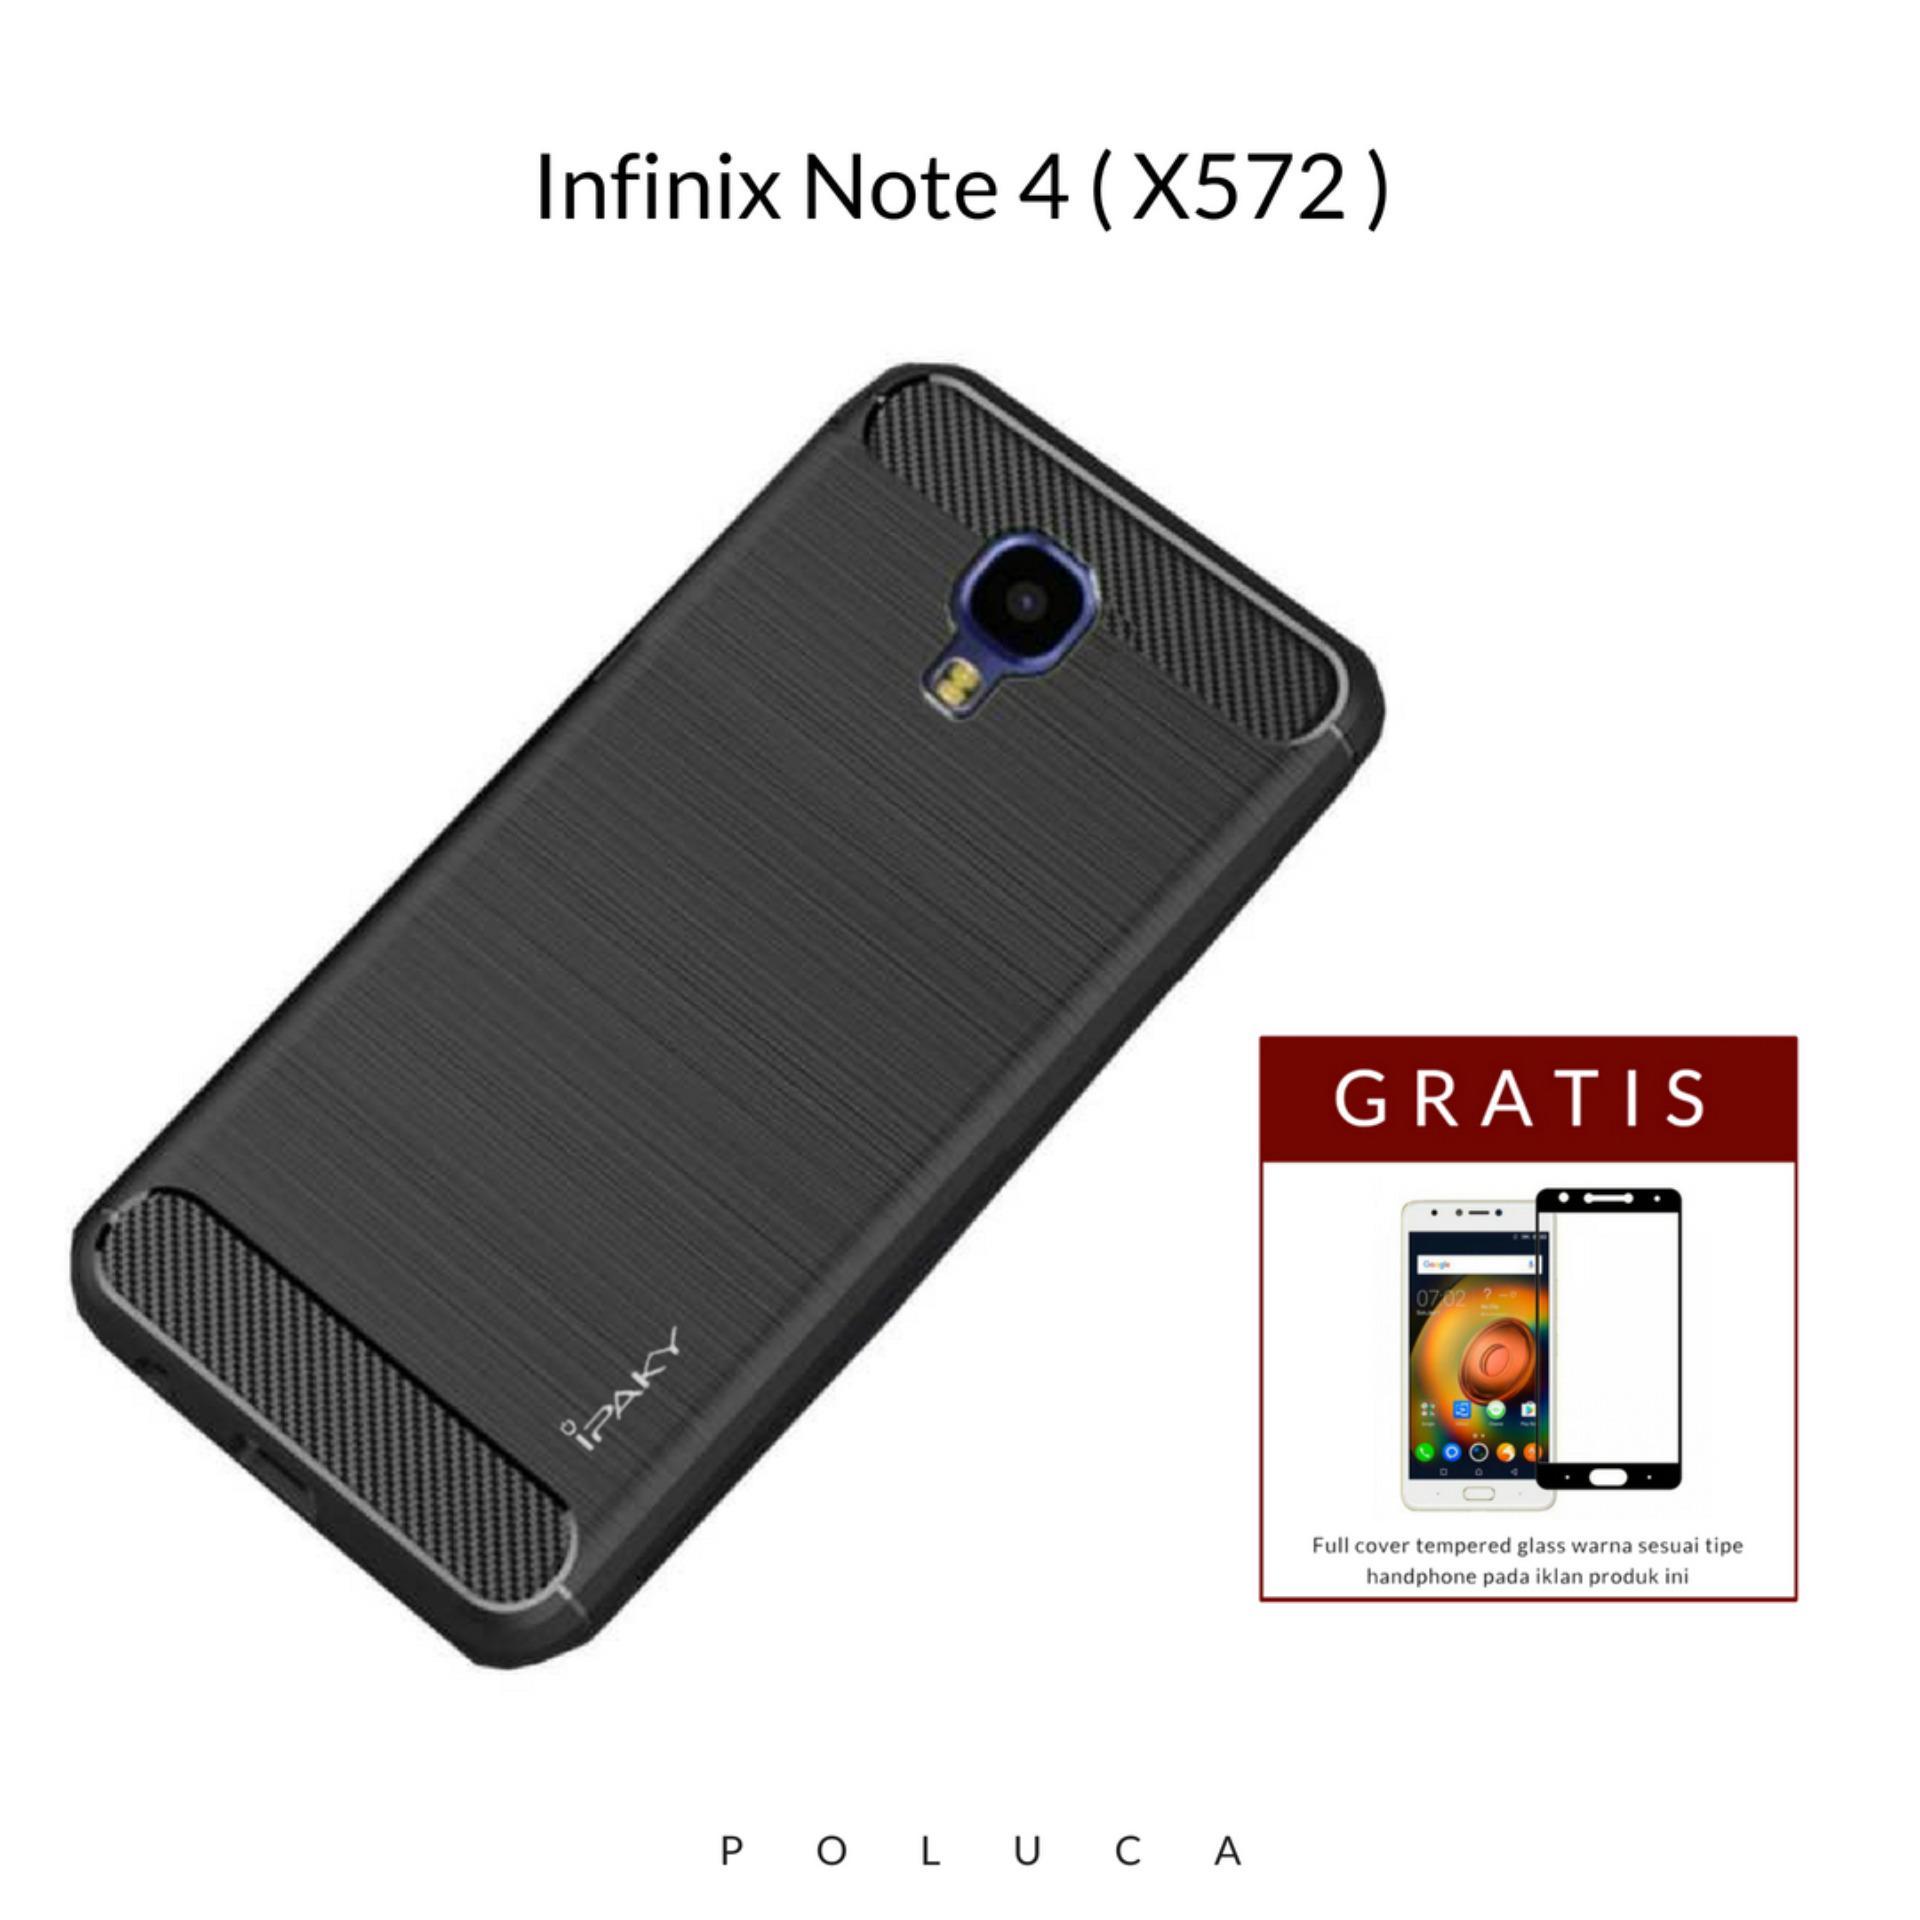 Poluca Luxury Case For Infinix Note 4 ( X572 ) Carbon Brushed TPU Shoockproof - Black + Full Cover